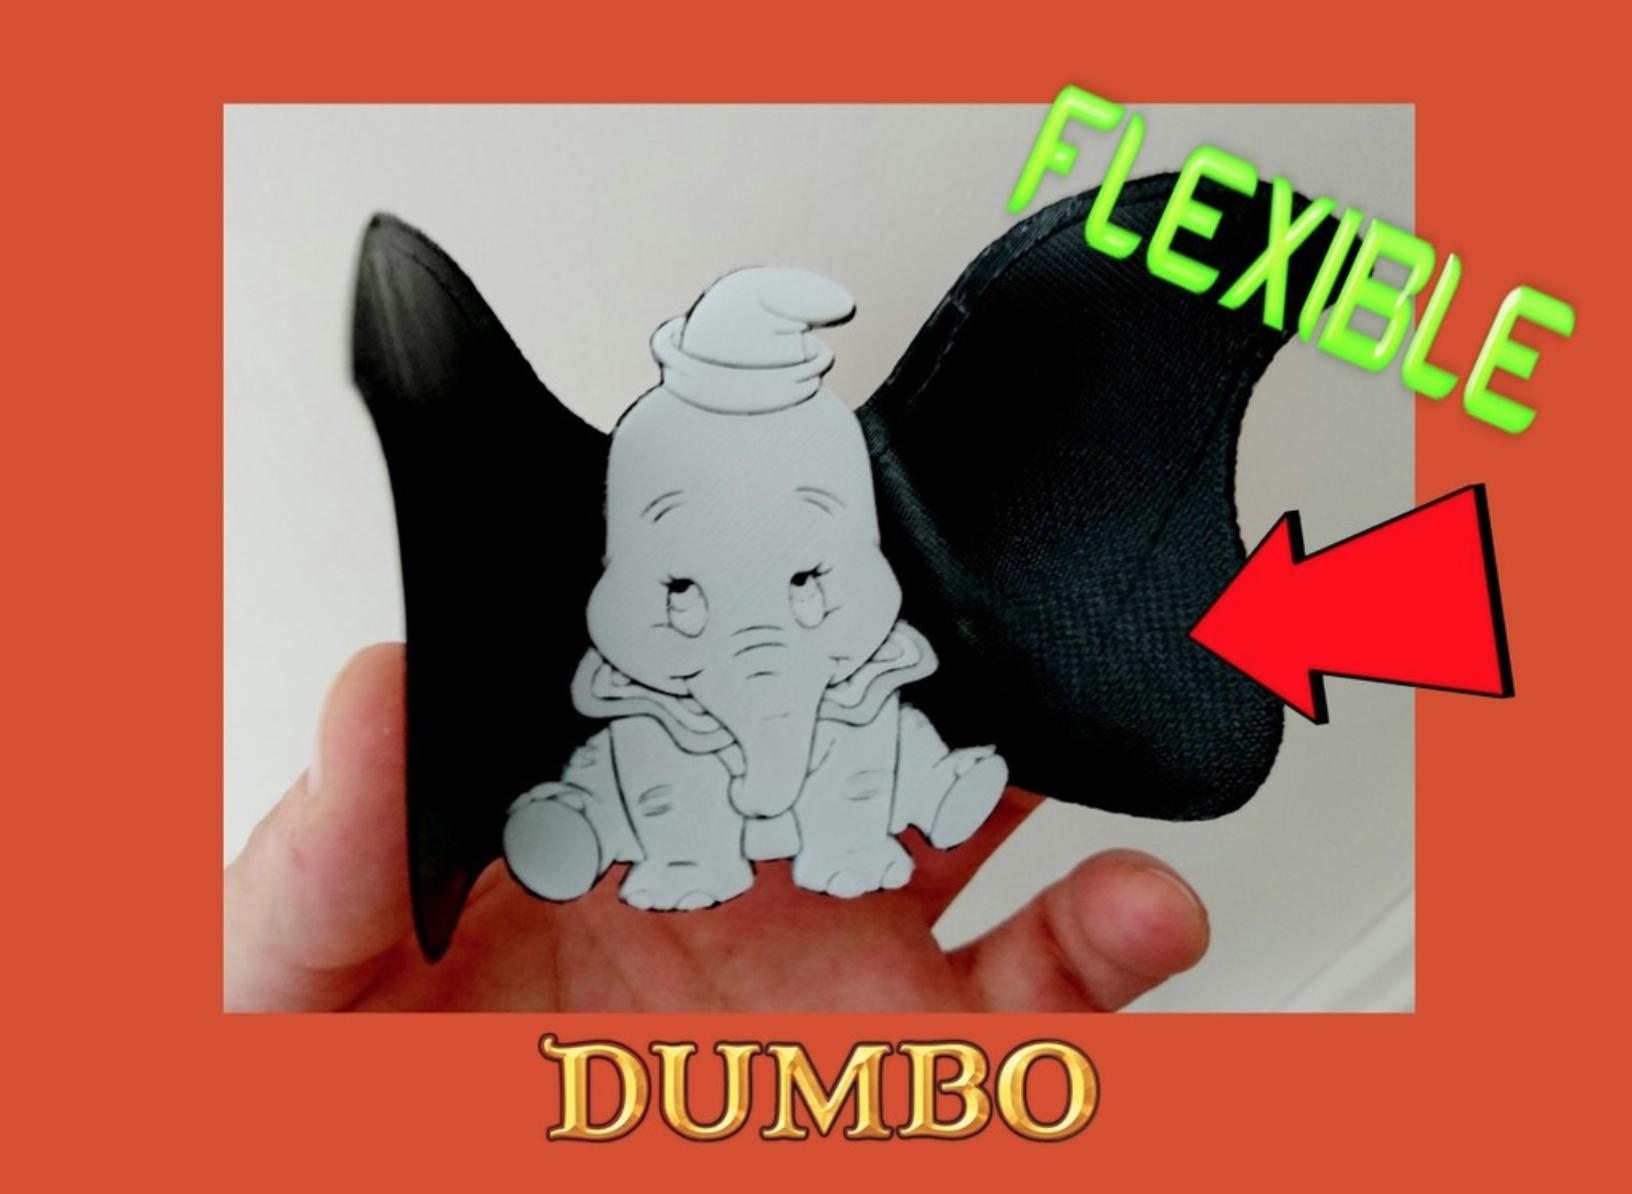 Capture d'écran 2017-10-07 à 18.25.50.png Download free STL file Dumbo flexible 3D drawing • Design to 3D print, 3dlito